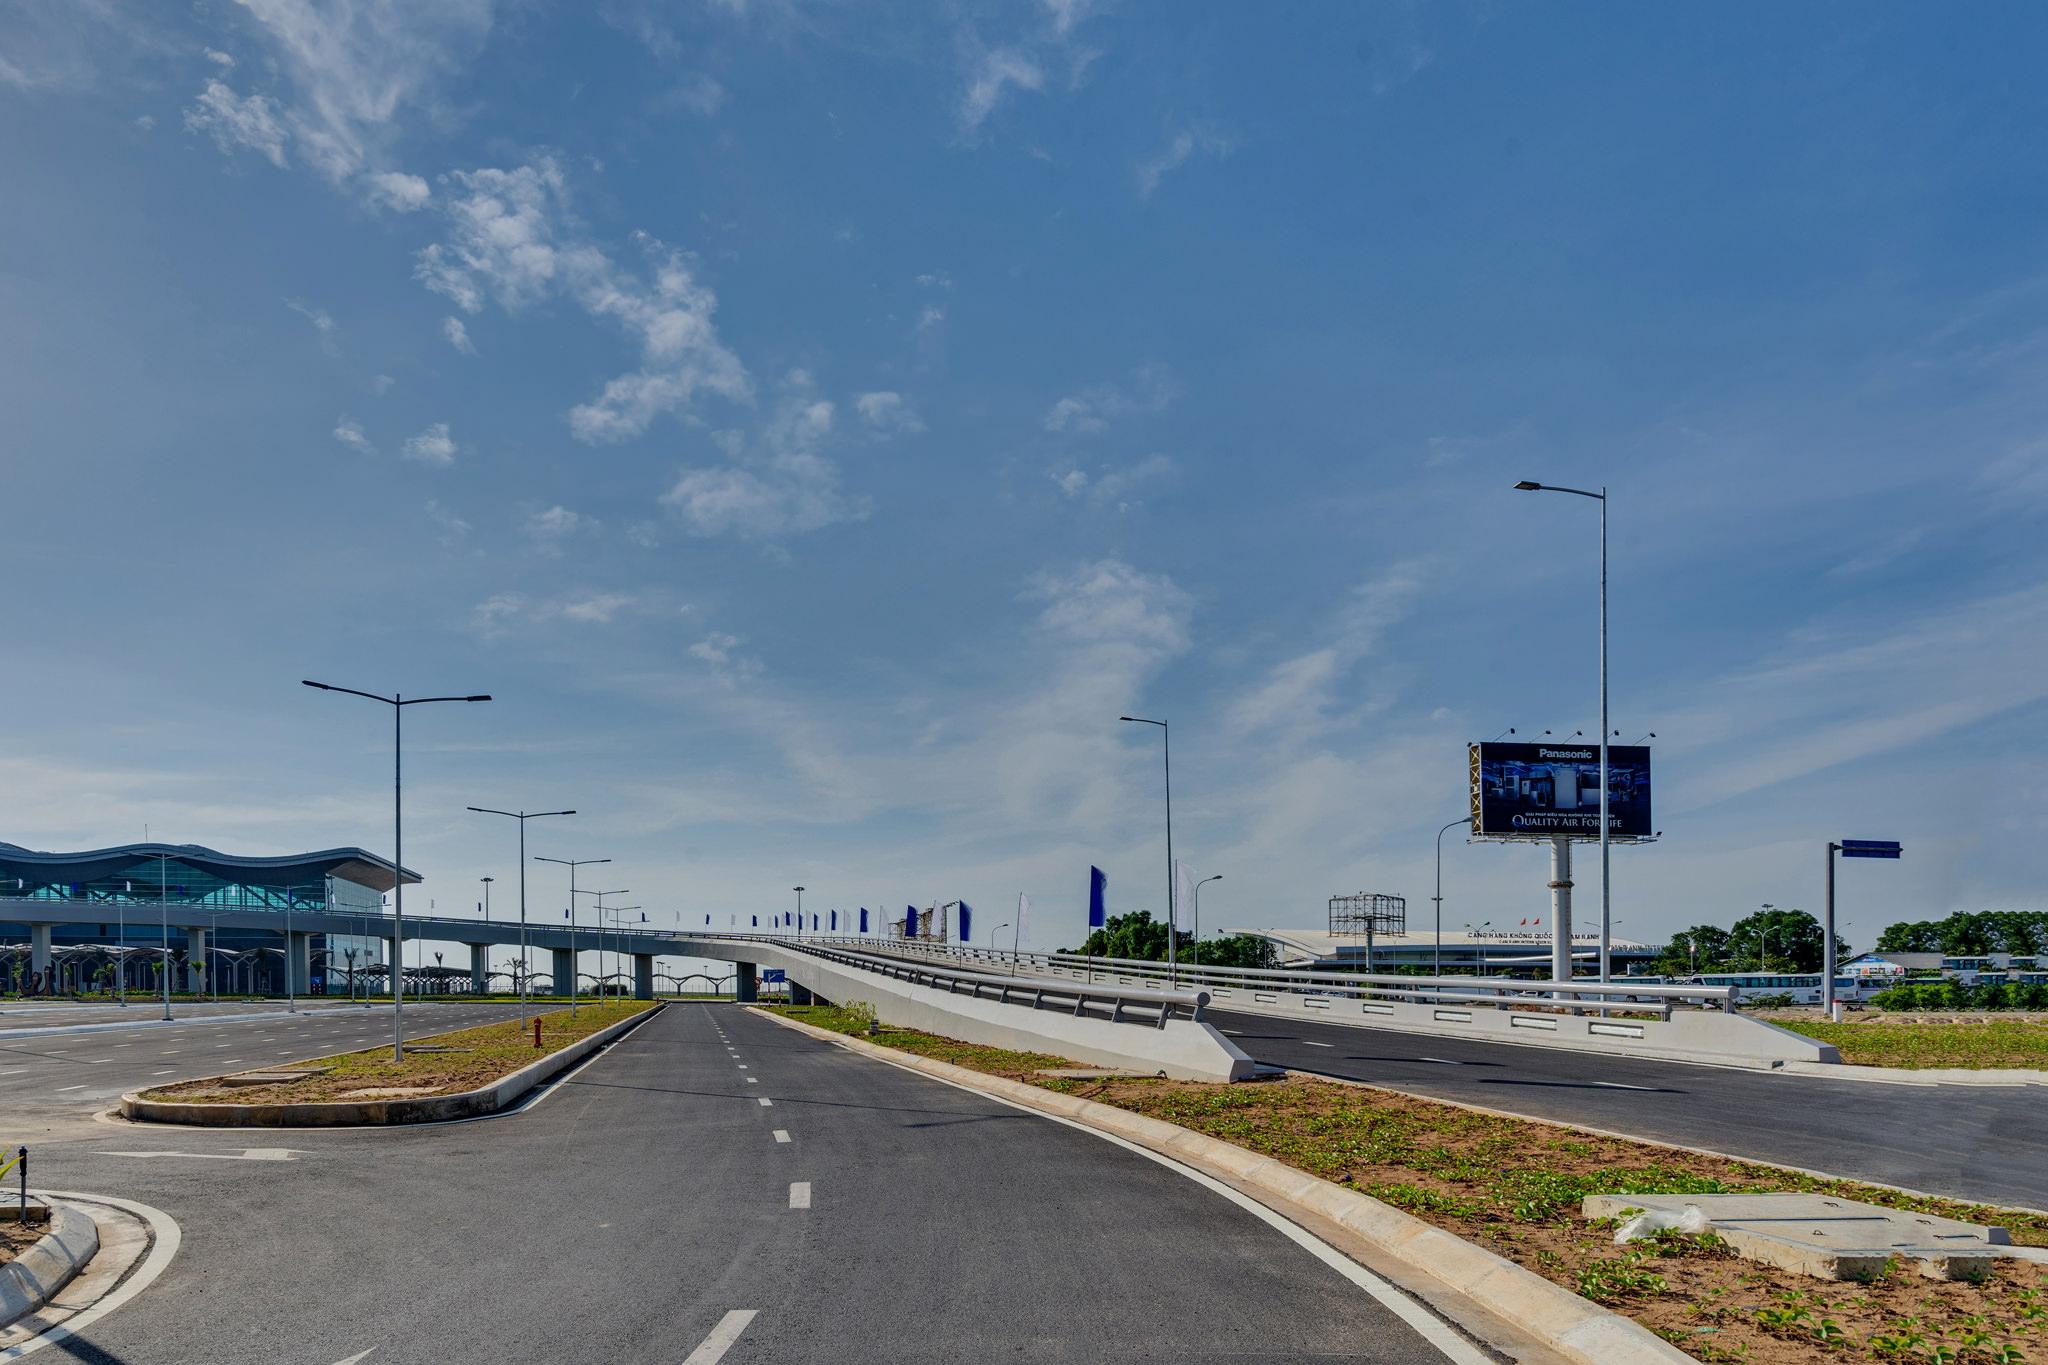 20180626 - Cam Ranh Airport - Architecture - 0246.jpg